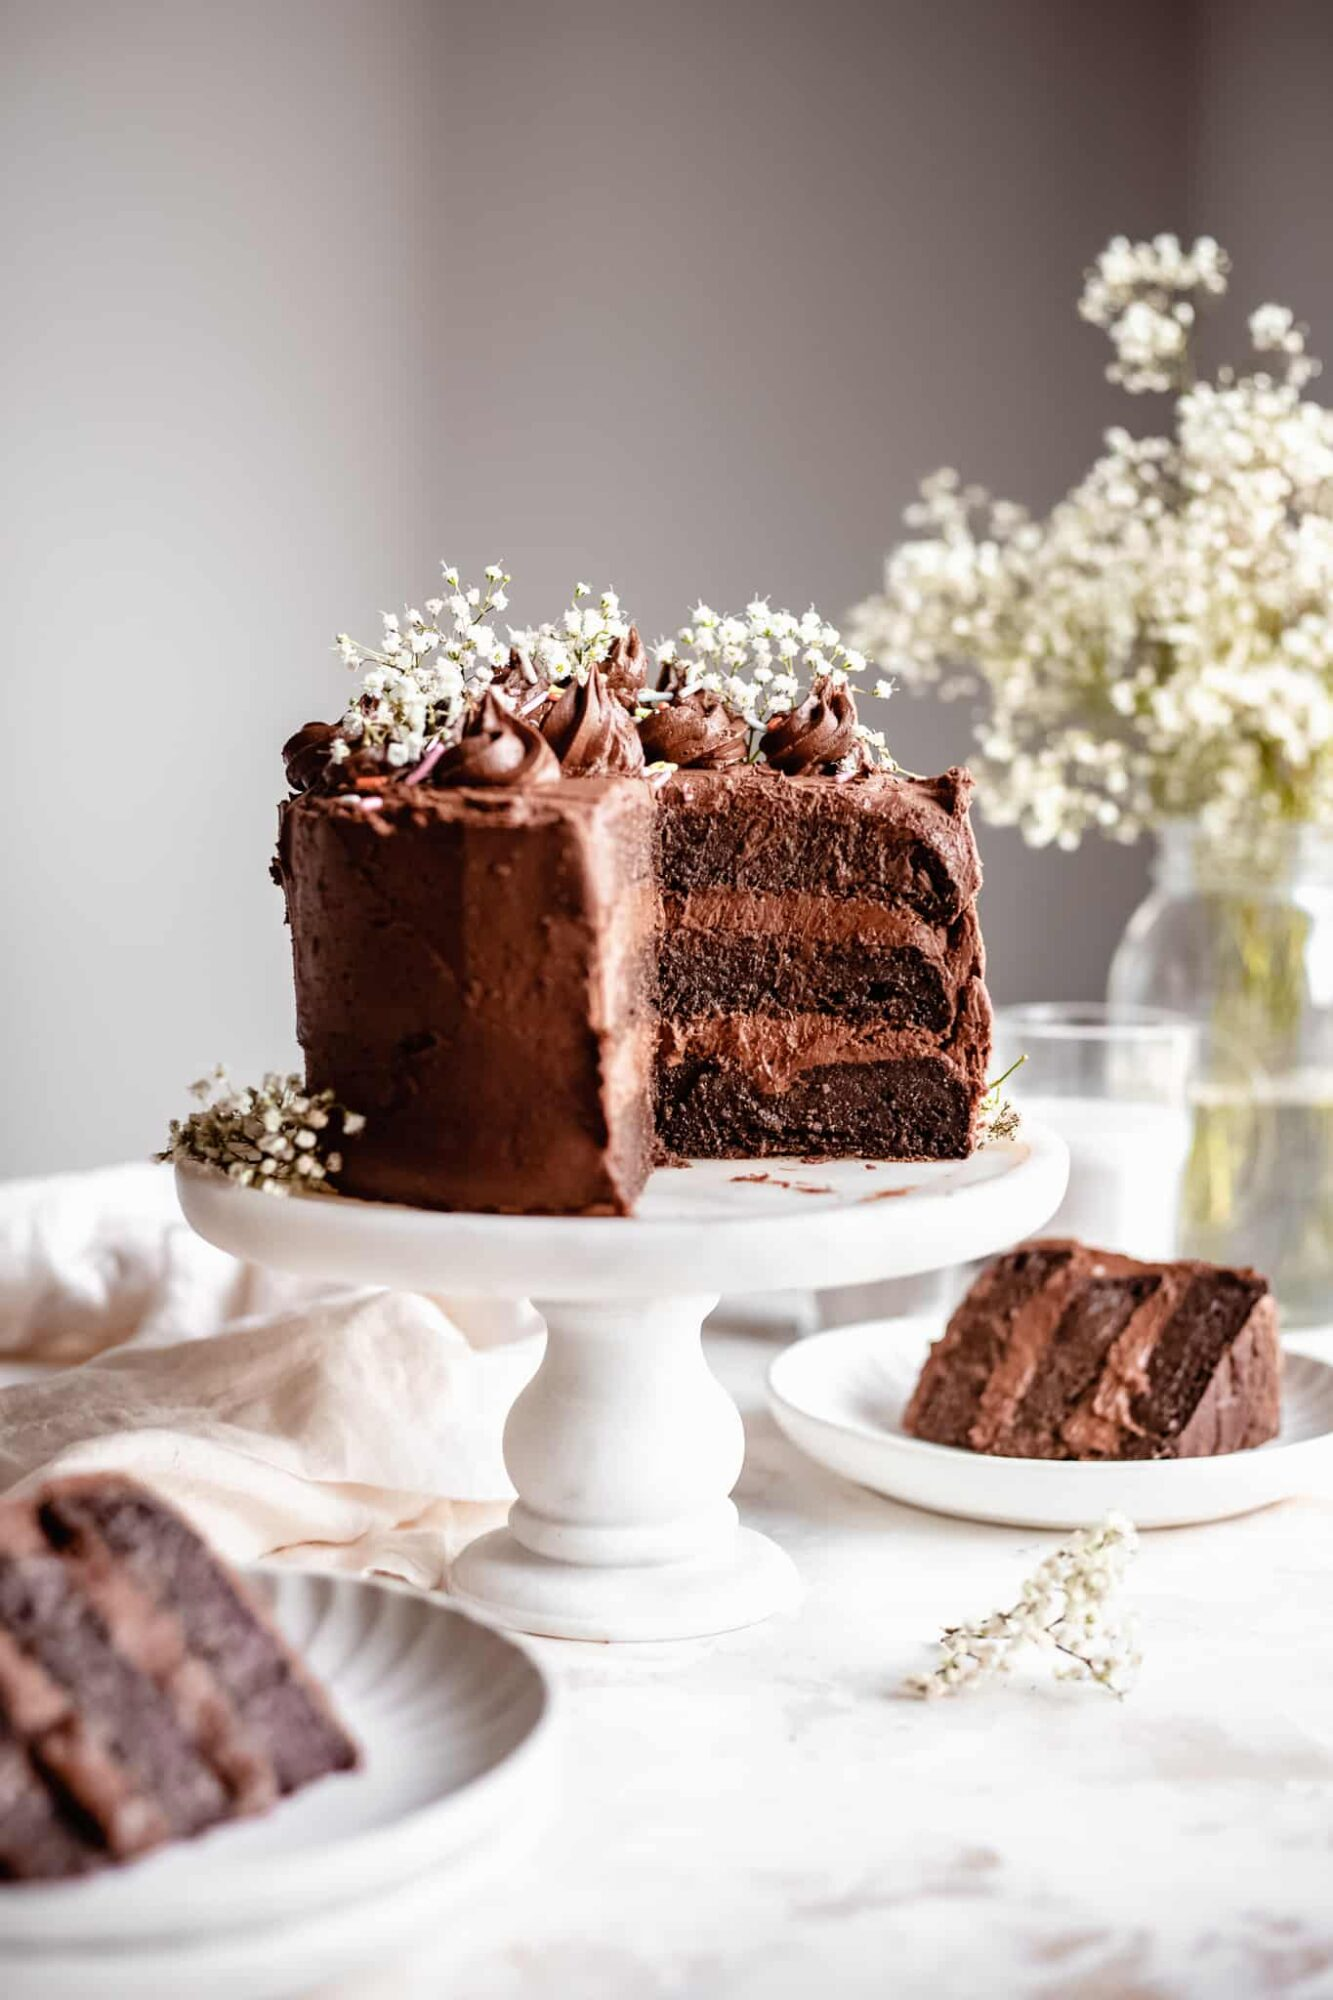 three tiered chocolate zucchini cake with slices